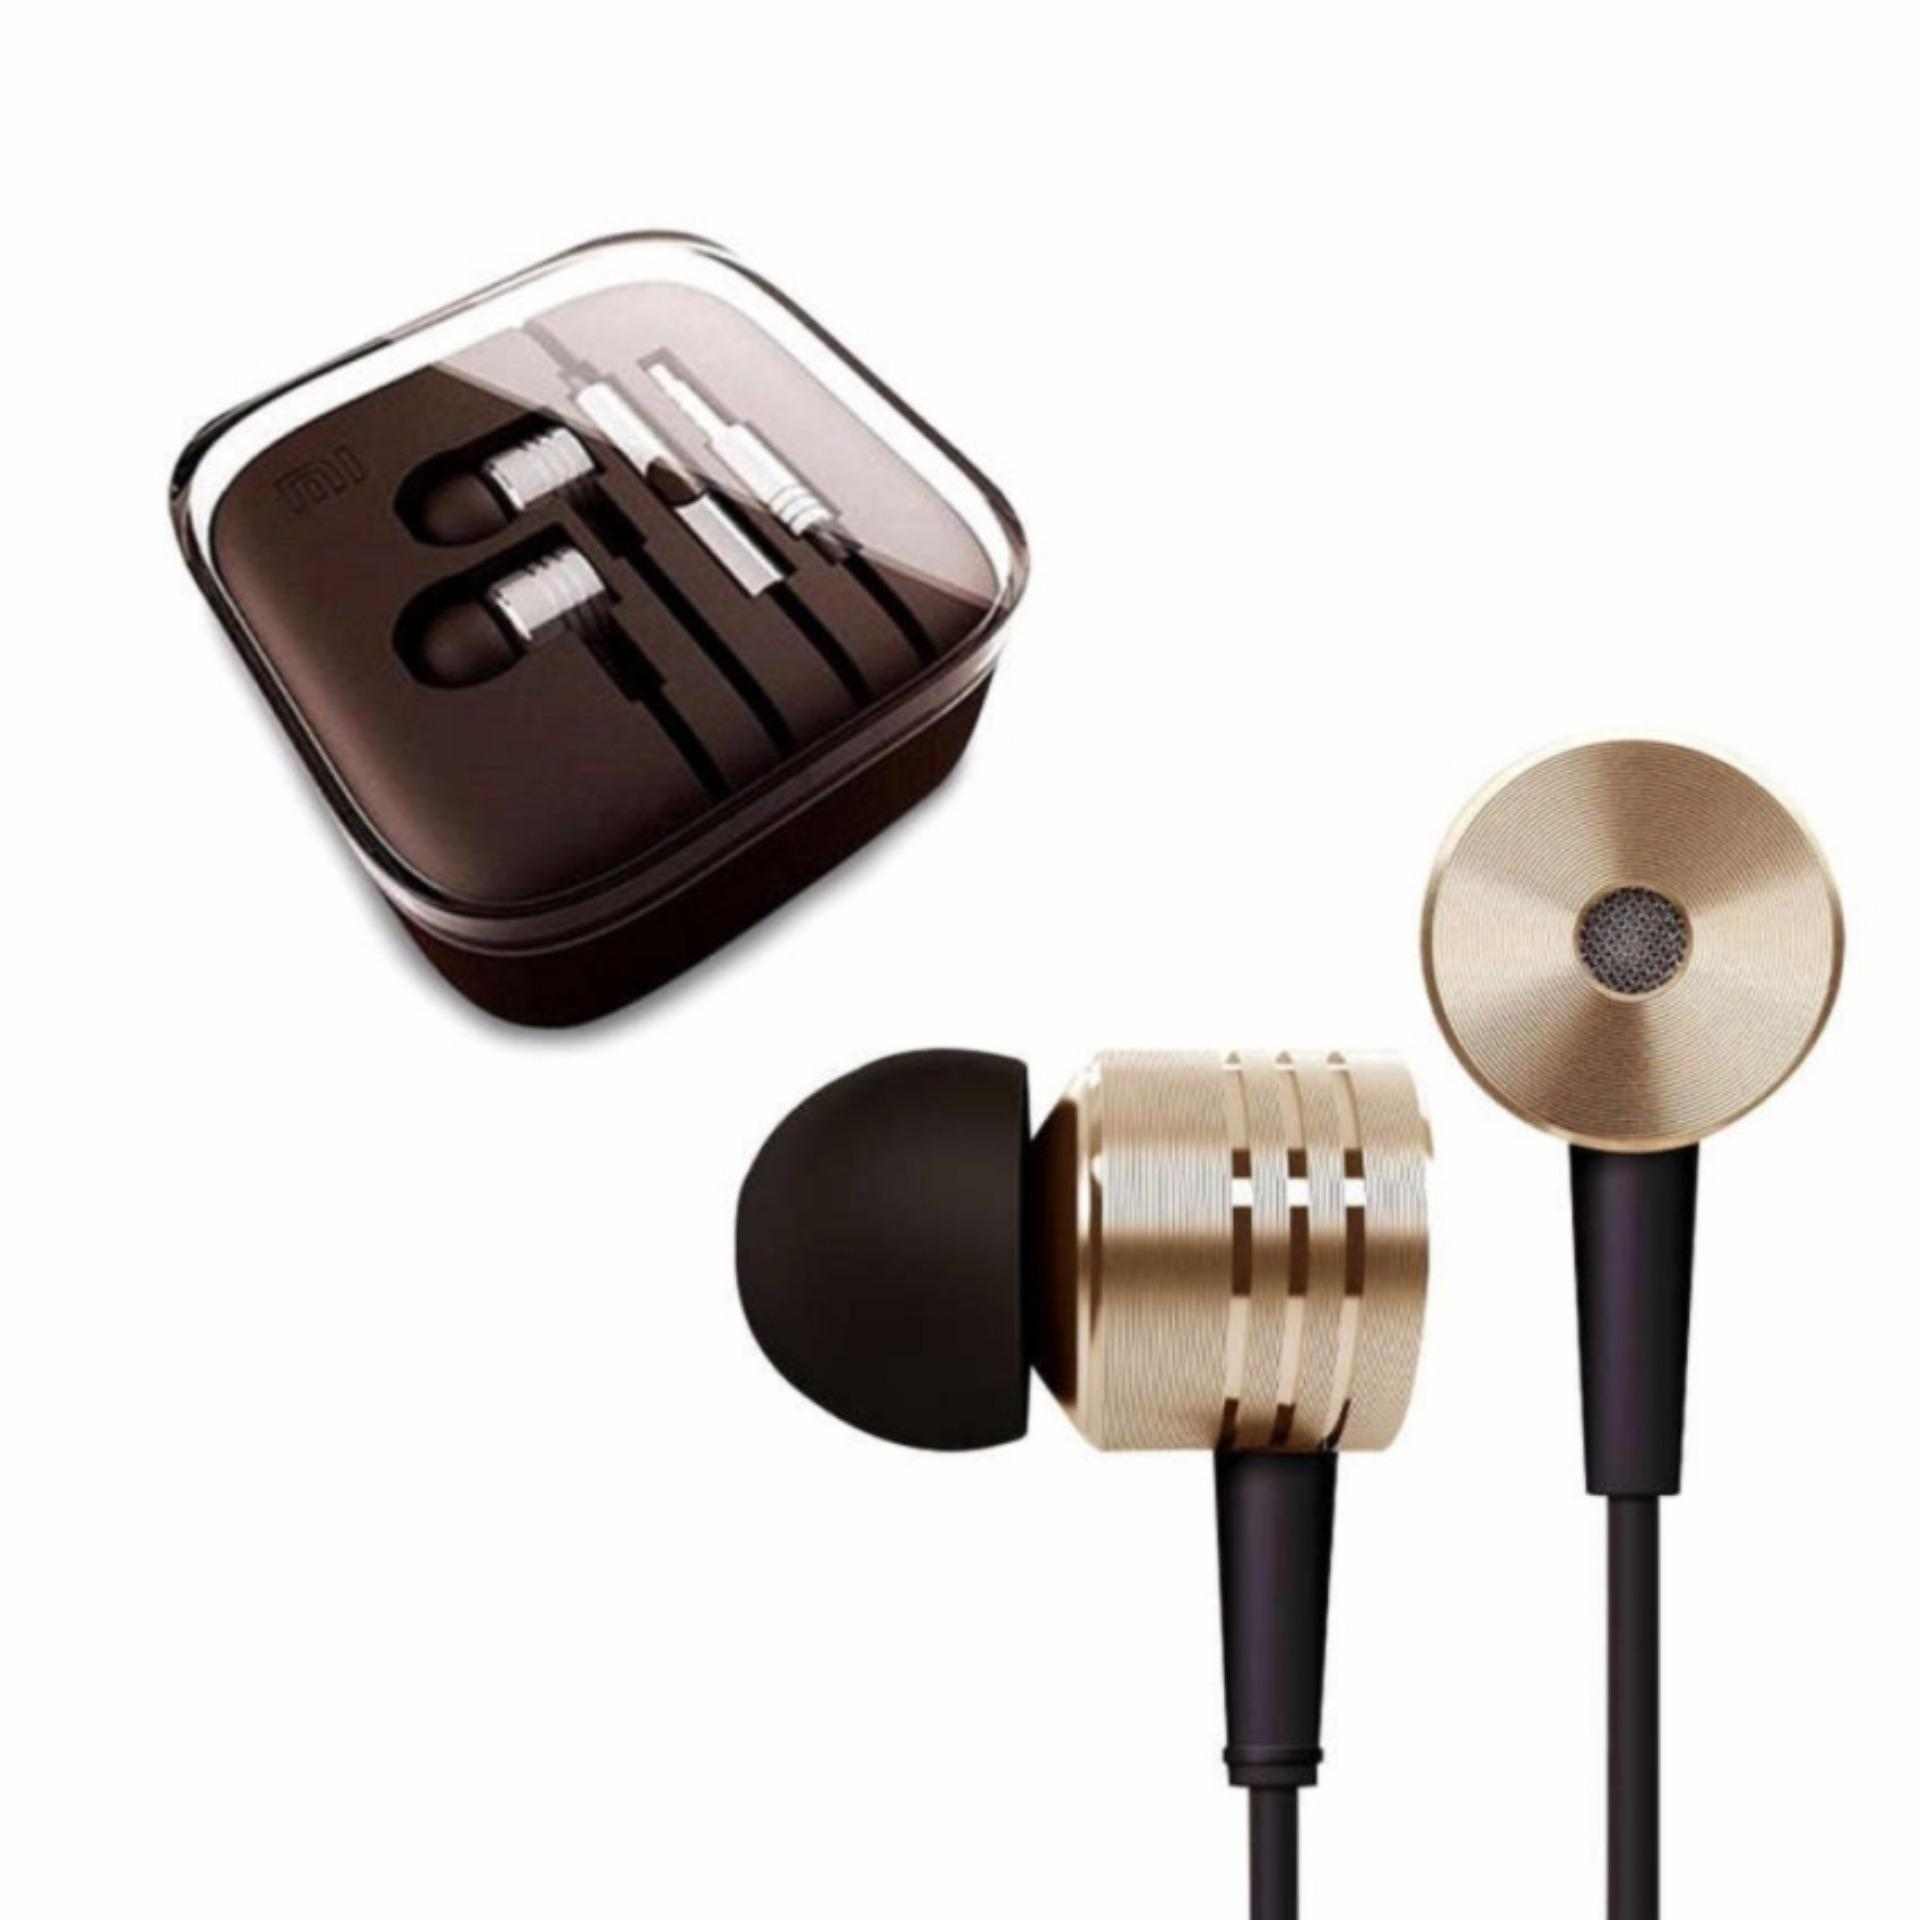 ... Xiaomi Earphone Big Bass Piston Mi 2nd Generation Handsfree/Headset - Gold ...